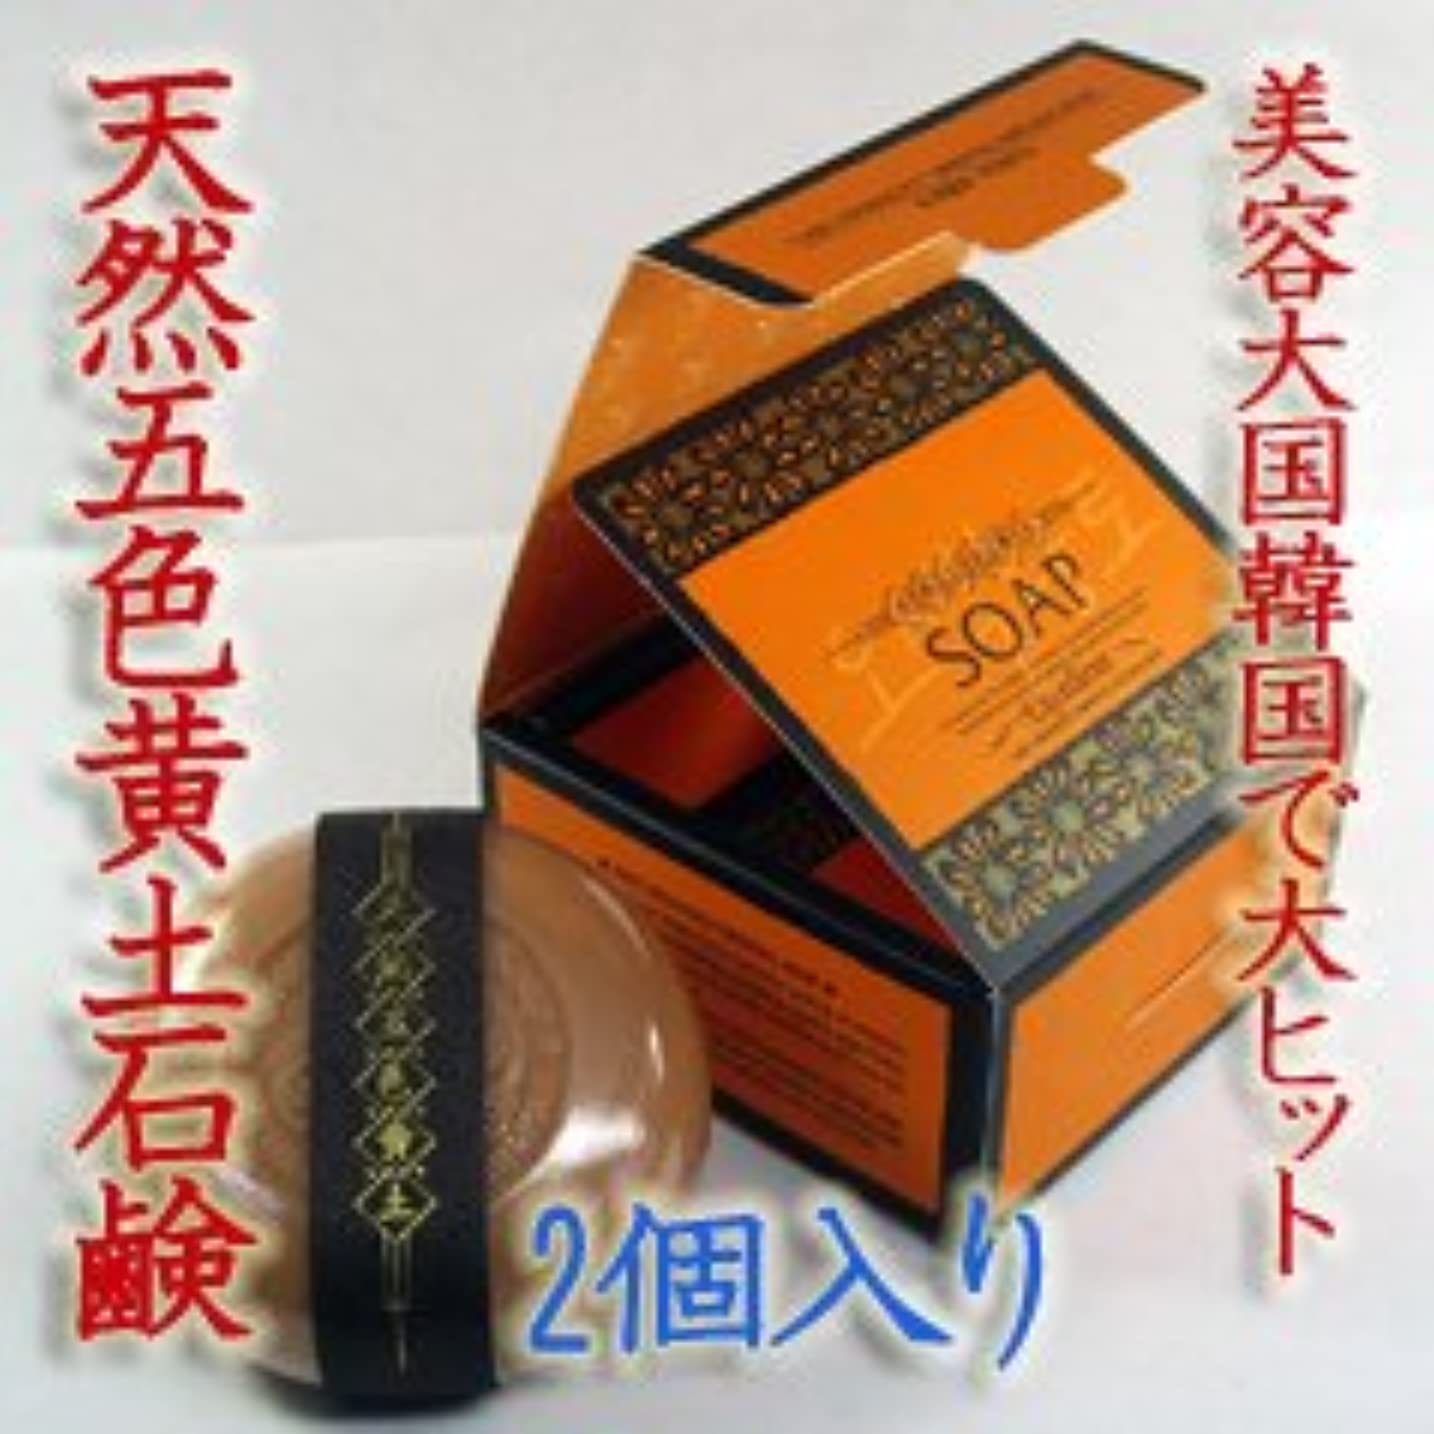 アッパー化学者平日美容石鹸 【五色黄土石鹸 2個入り】 ピエラス正規品